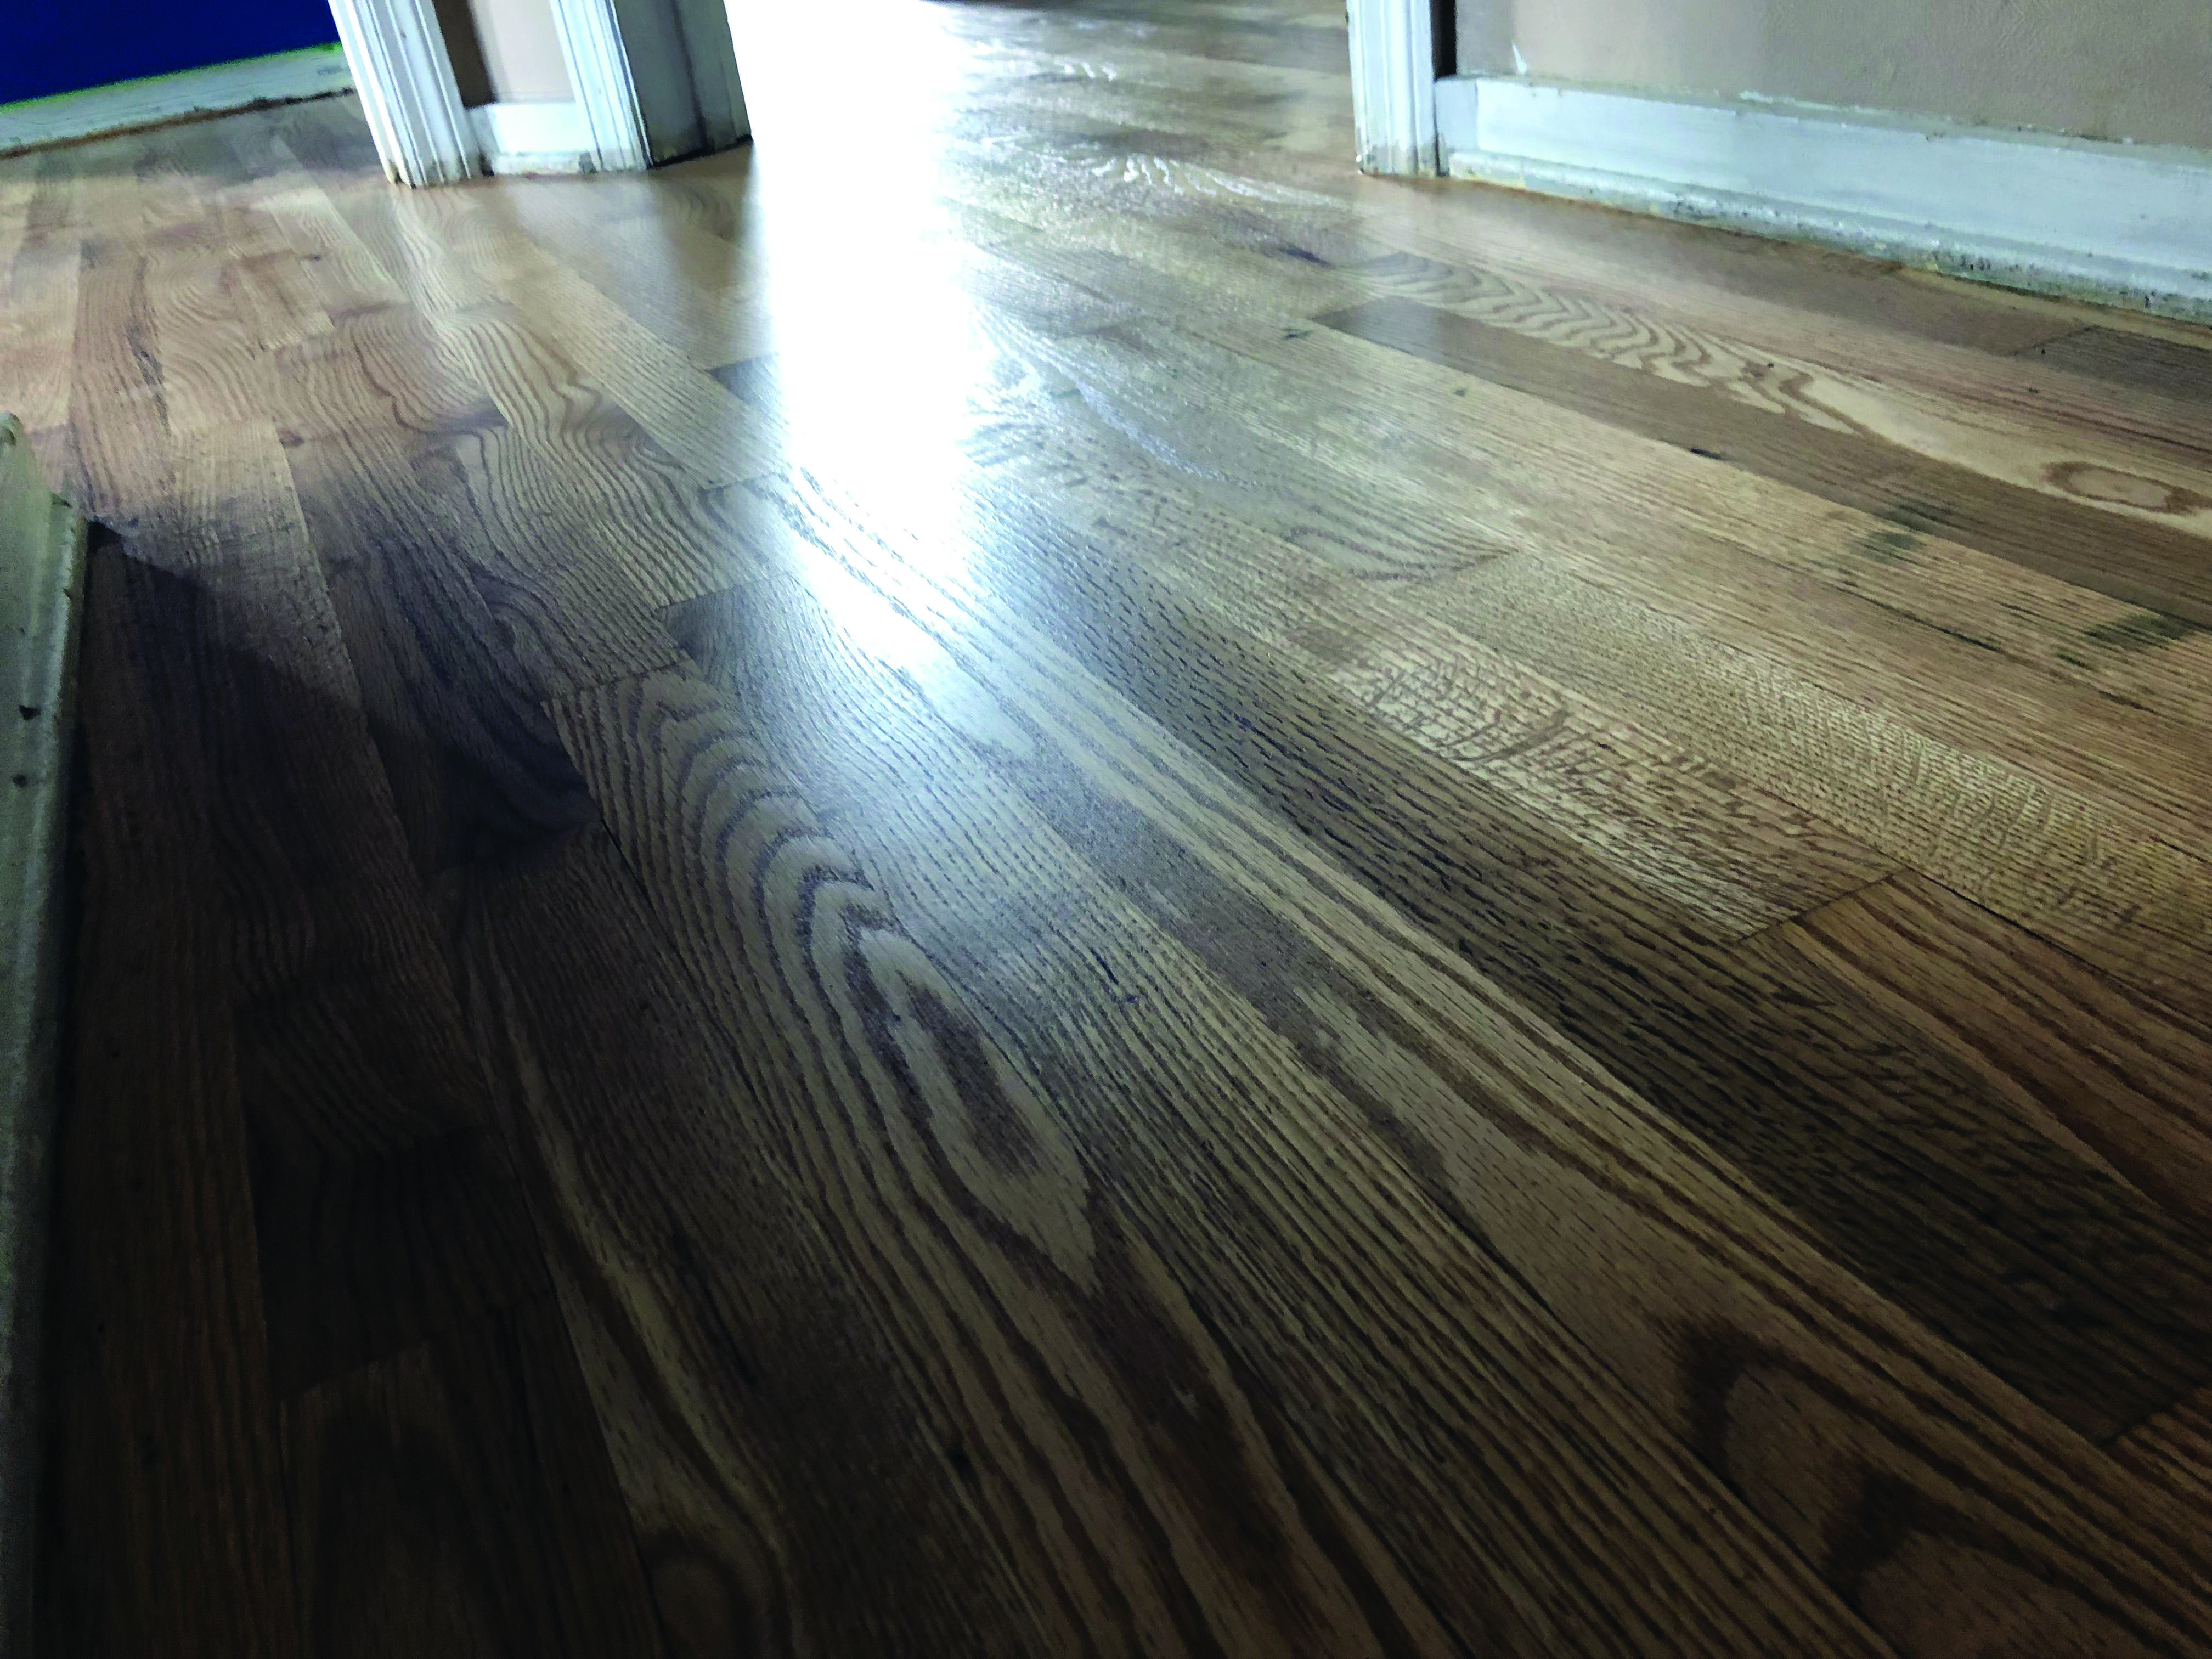 Fresh Hardwood Floor Refinishing Grand Junction Co On This Favorite Site Hardwood Floors Hardwood Flooring